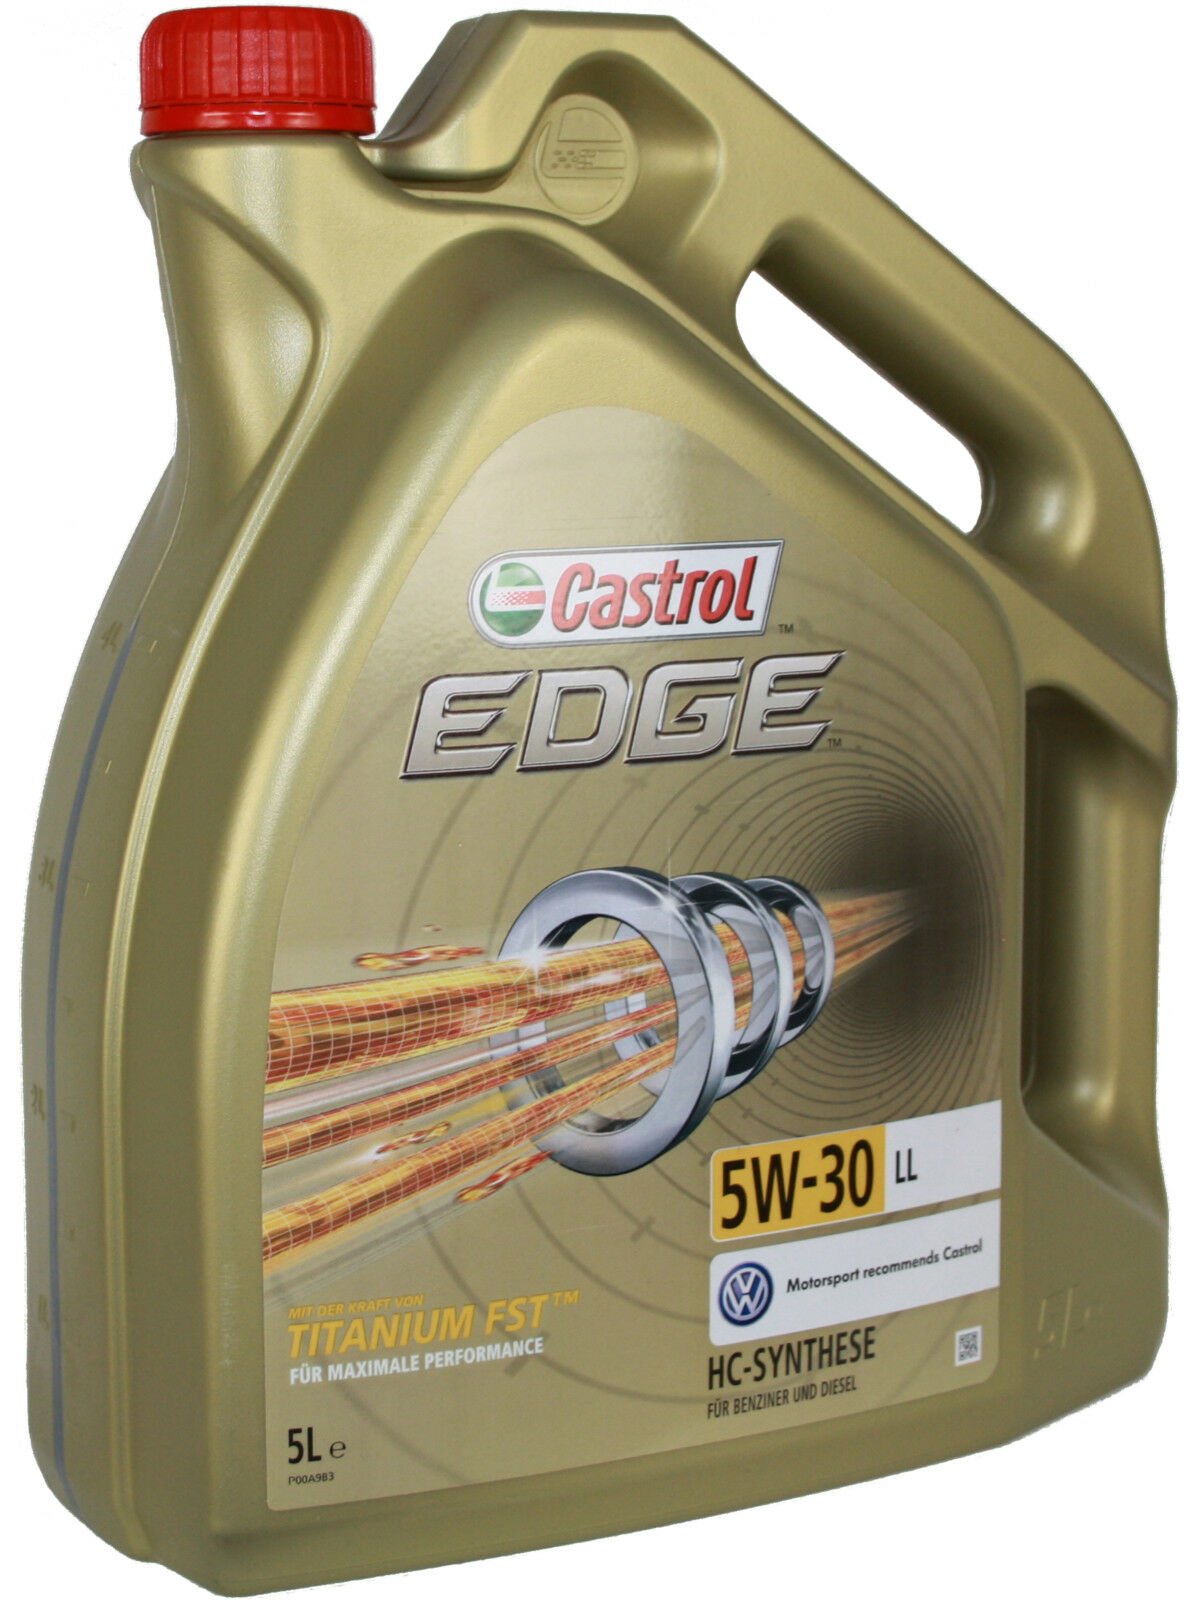 Castrol Edge TITANIUM FST LongLife 3 15669E Motoröl 5w-30 -  5 Liter